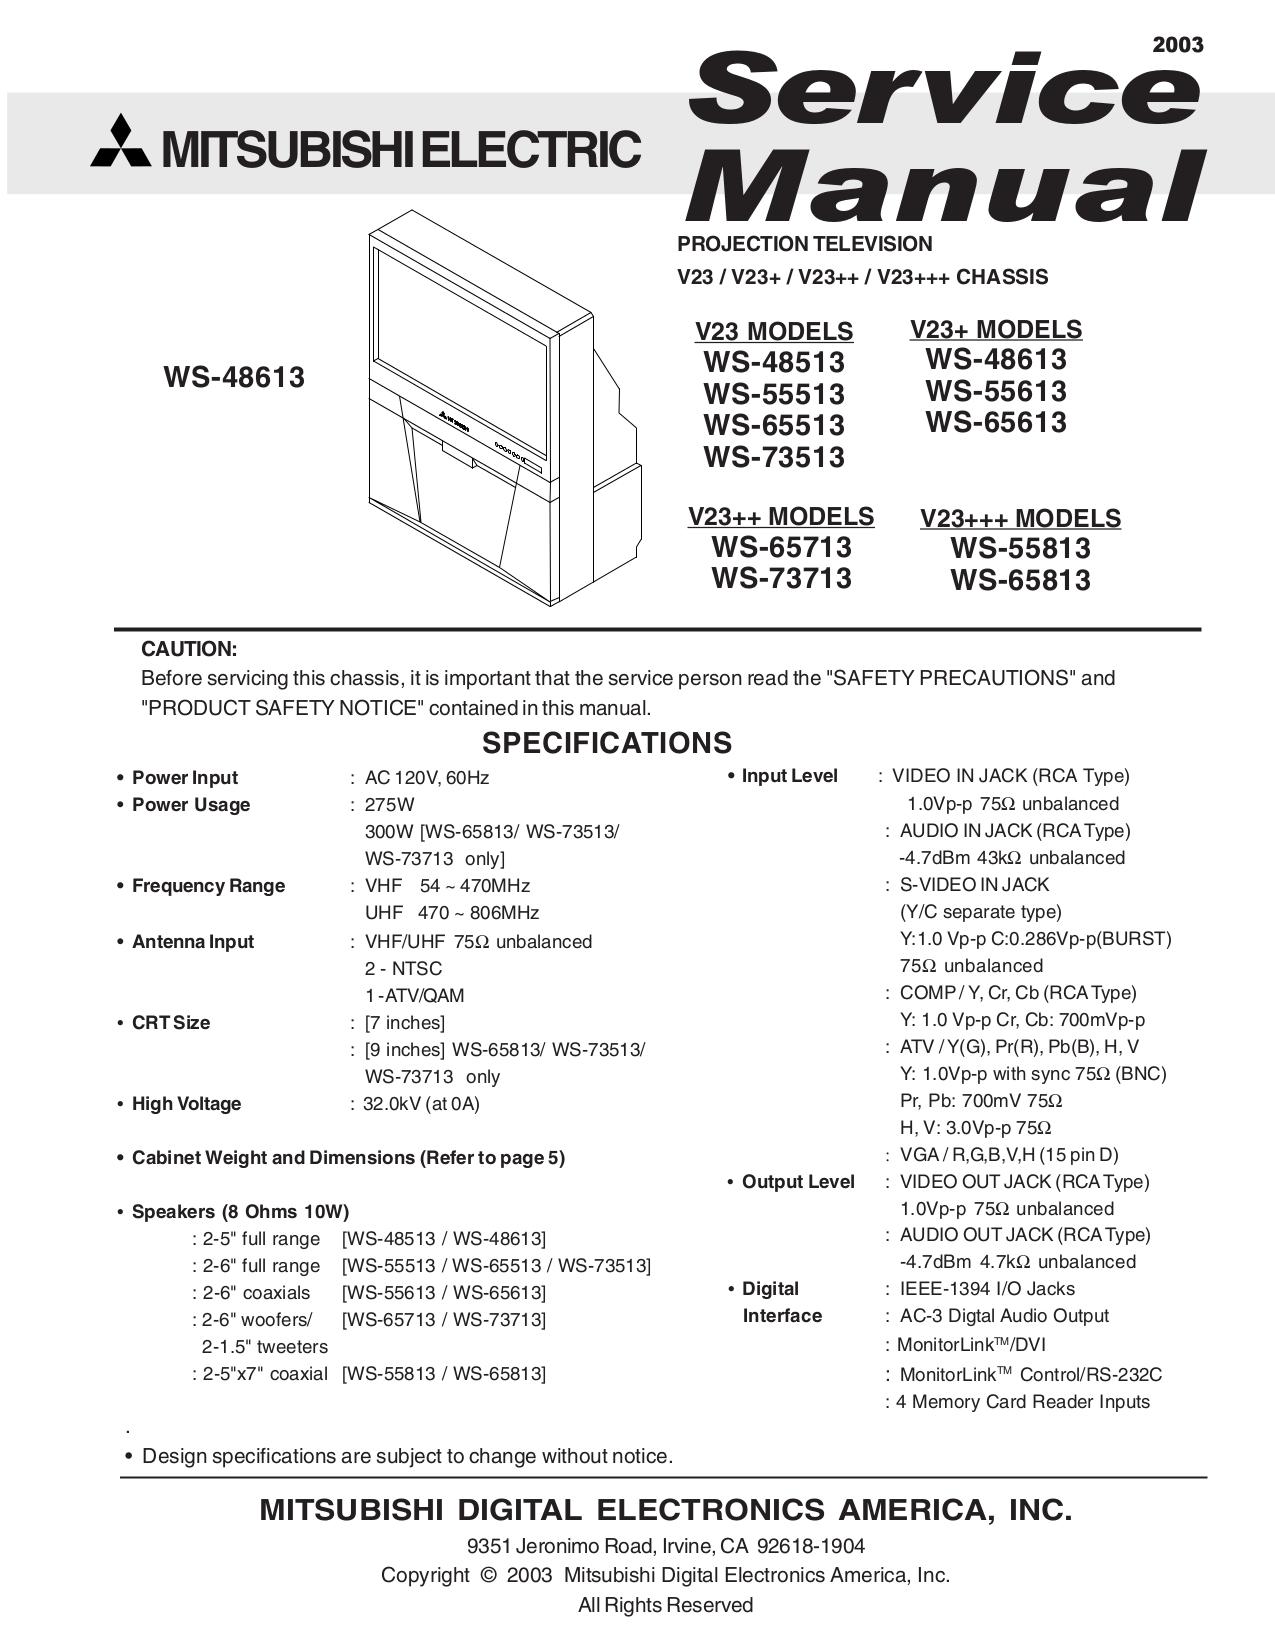 download free pdf for mitsubishi ws 65813 tv manual rh umlib com service manual mitsubishi fg25k Mitsubishi TV Schematics